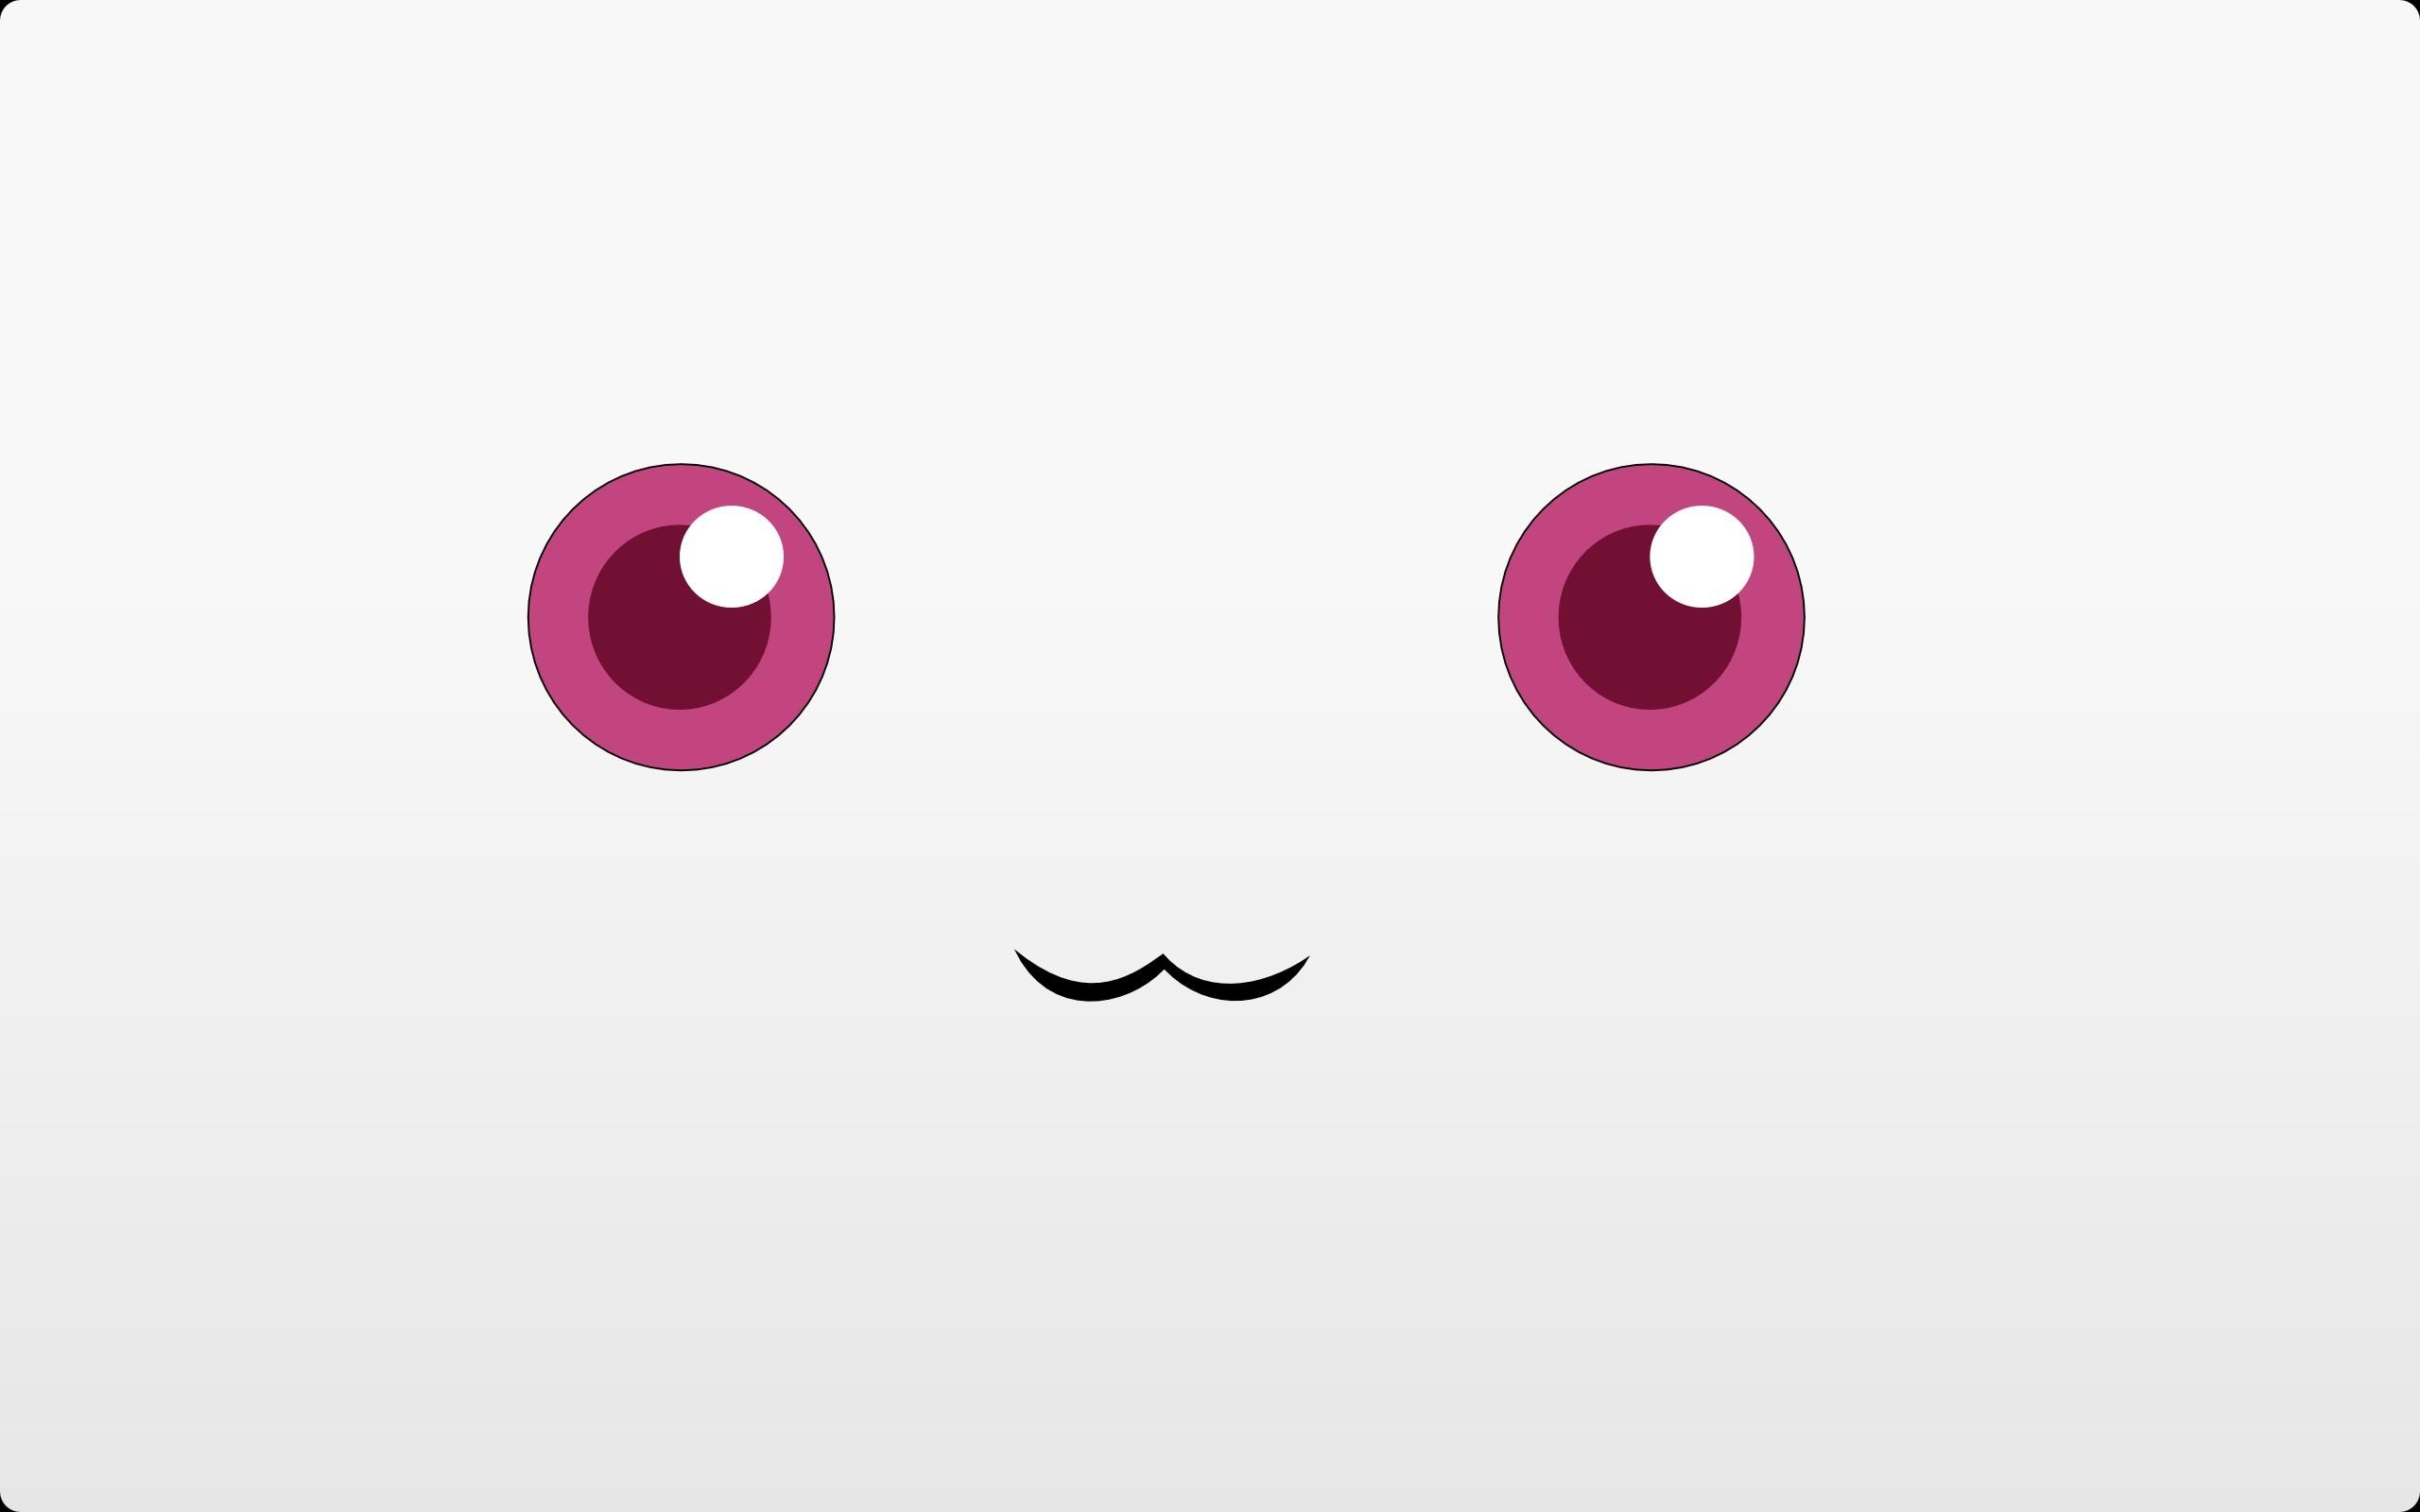 Illustration Mahou Shoujo Madoka Magica Text Logo Circle Pink Brand Magenta Icon Shape Line 2560x1600 Px